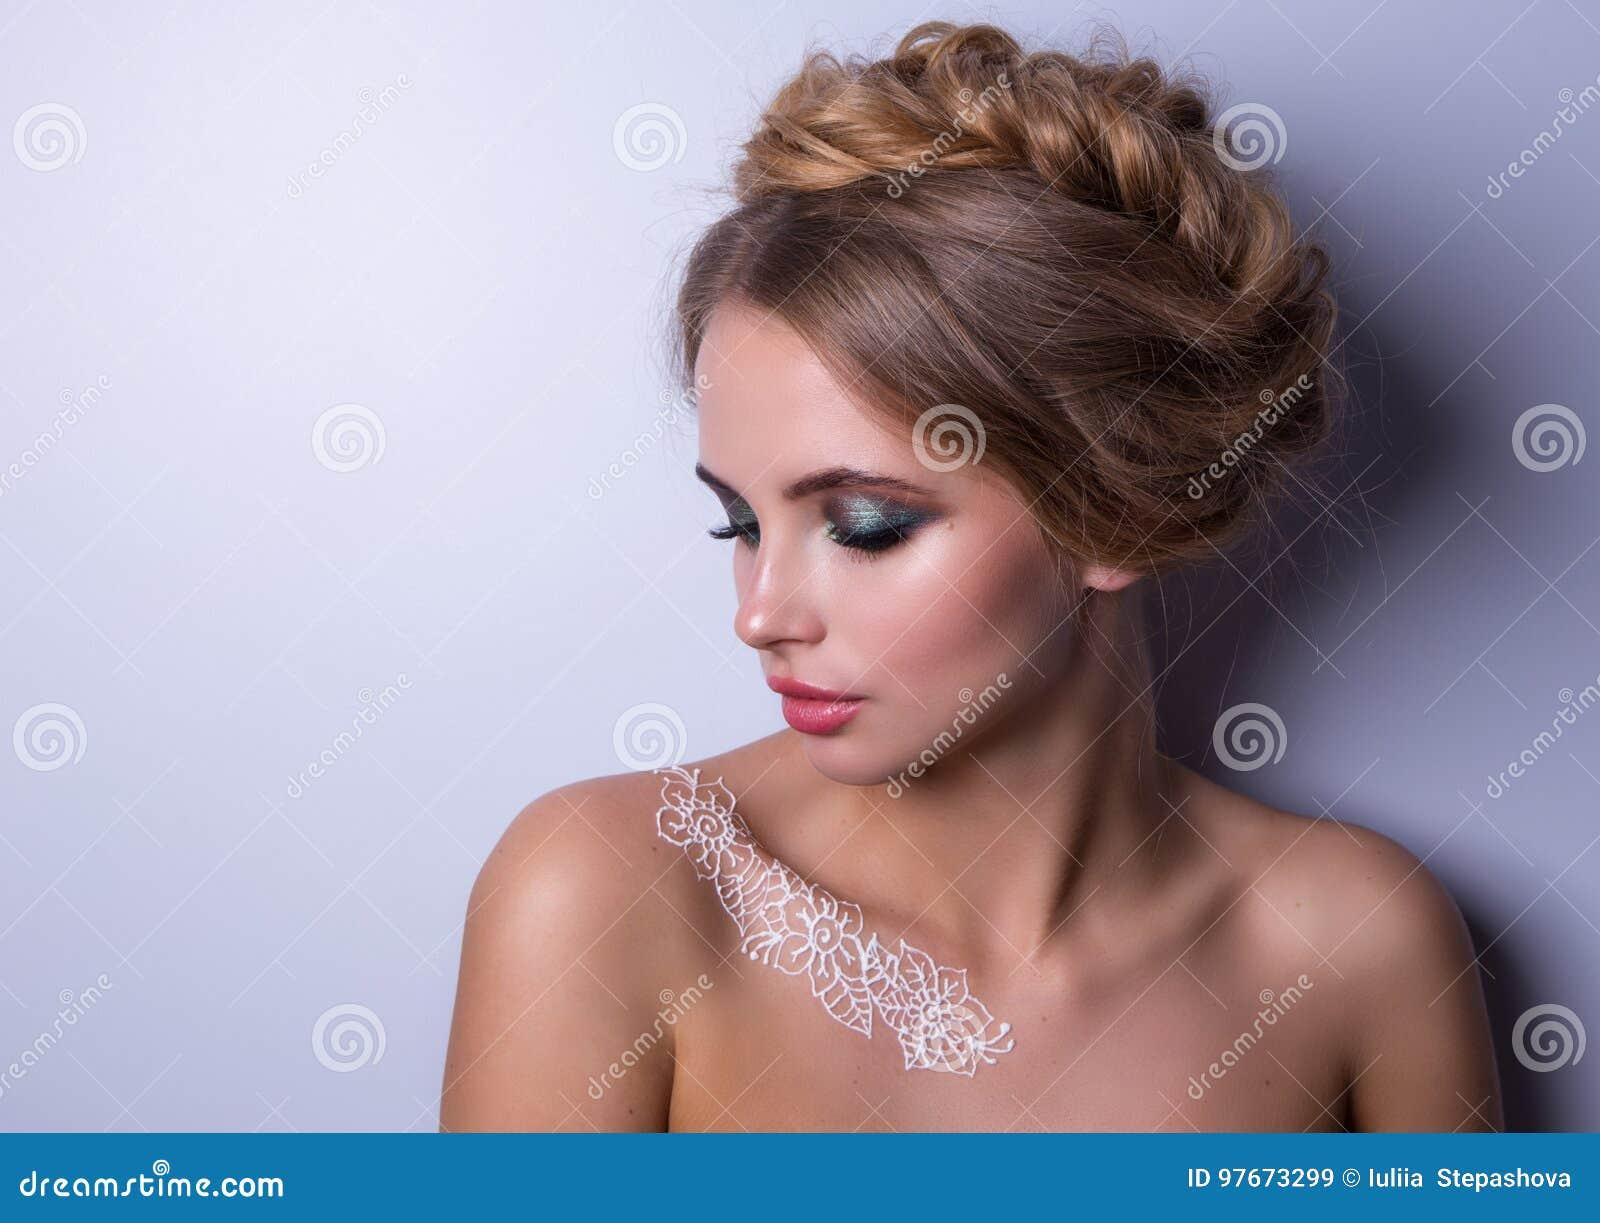 Beauty Fashion Model Woman , Portrait, Hairstyle With Braids. Mehndi , White Henna Tattoo On ...